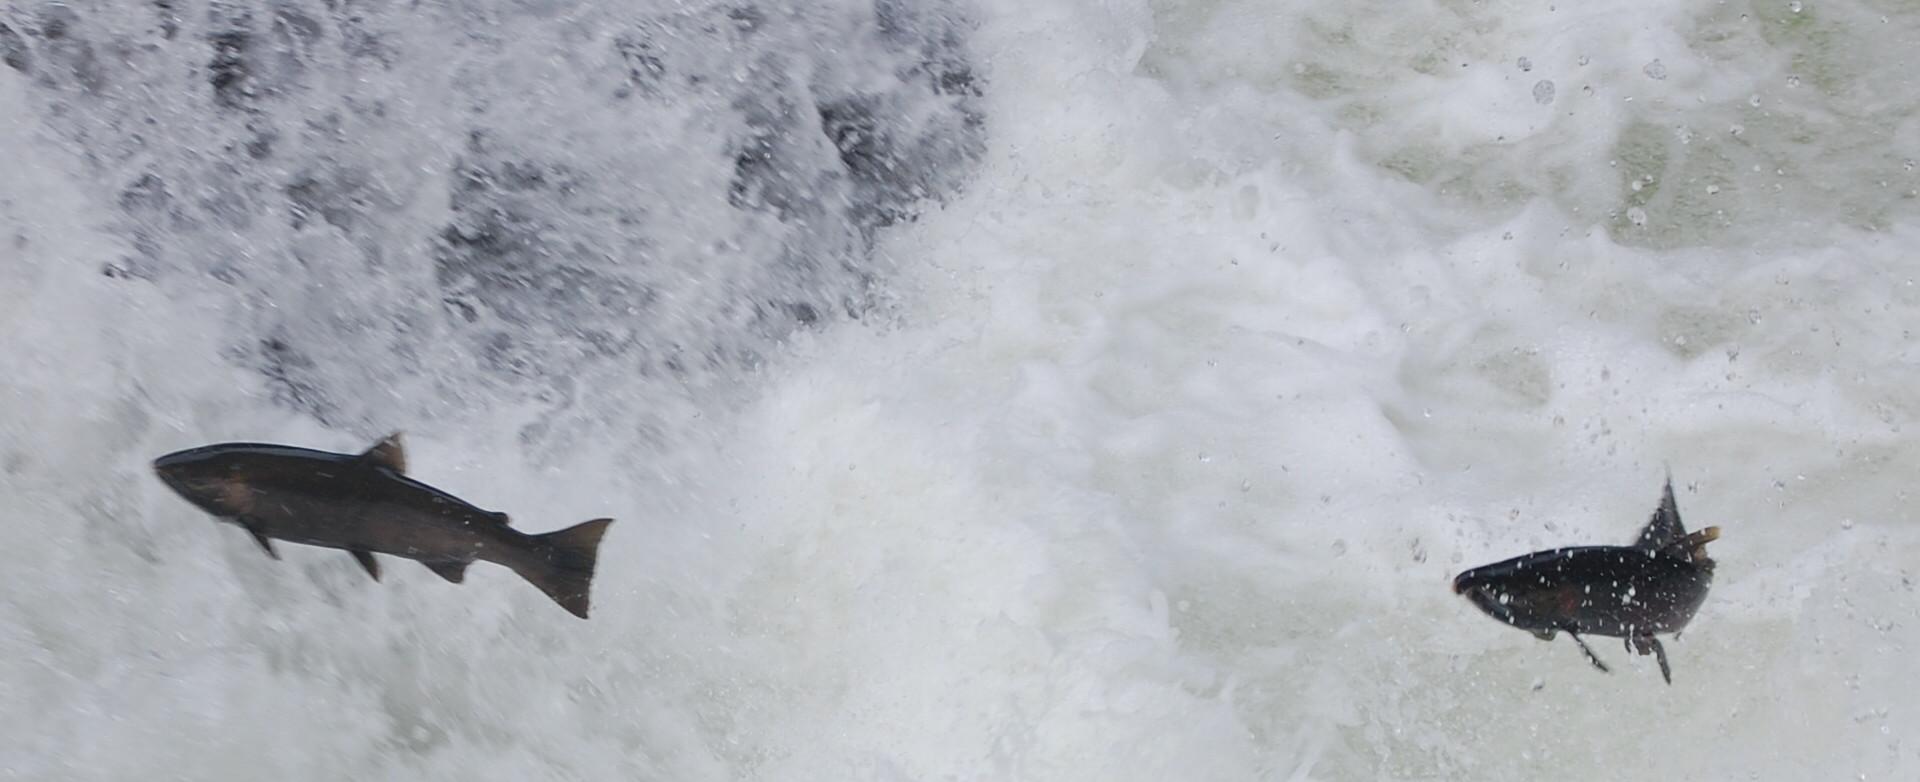 22_Salmon_Jumping1.jpg